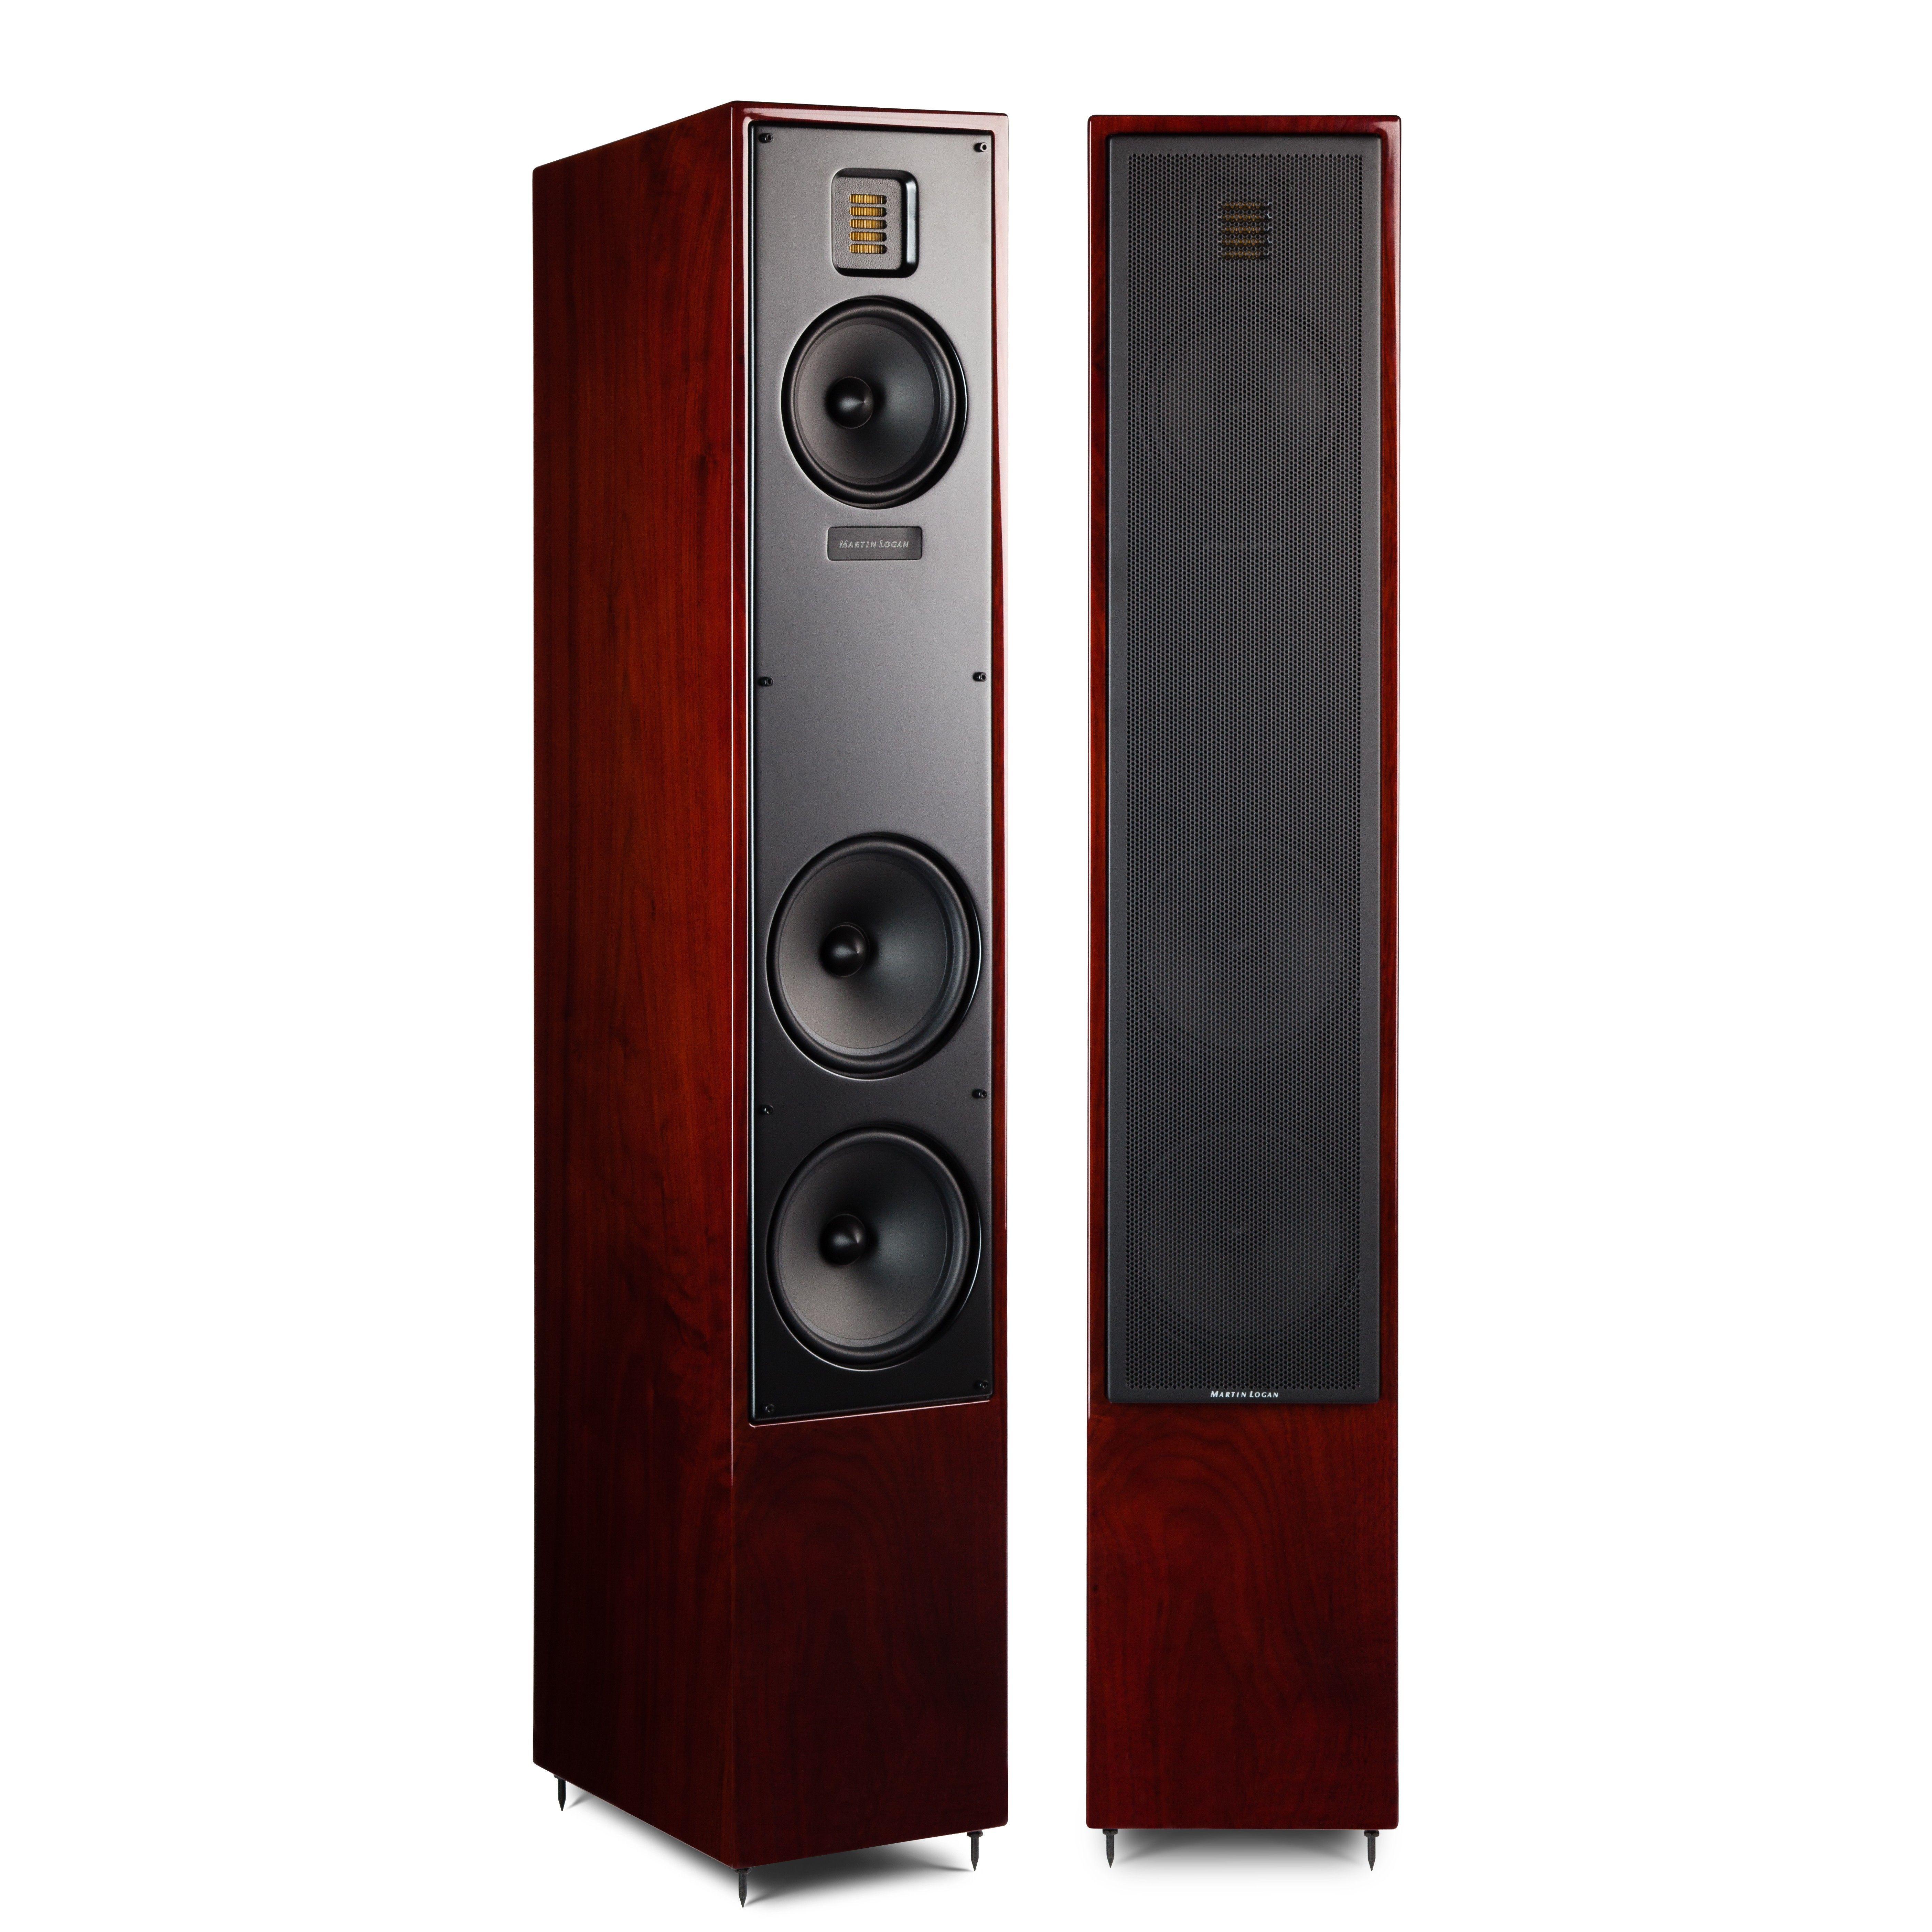 pure speaker logan way speakers alt fi hr bookshelf acoustics compact dreambox hi black martin pair